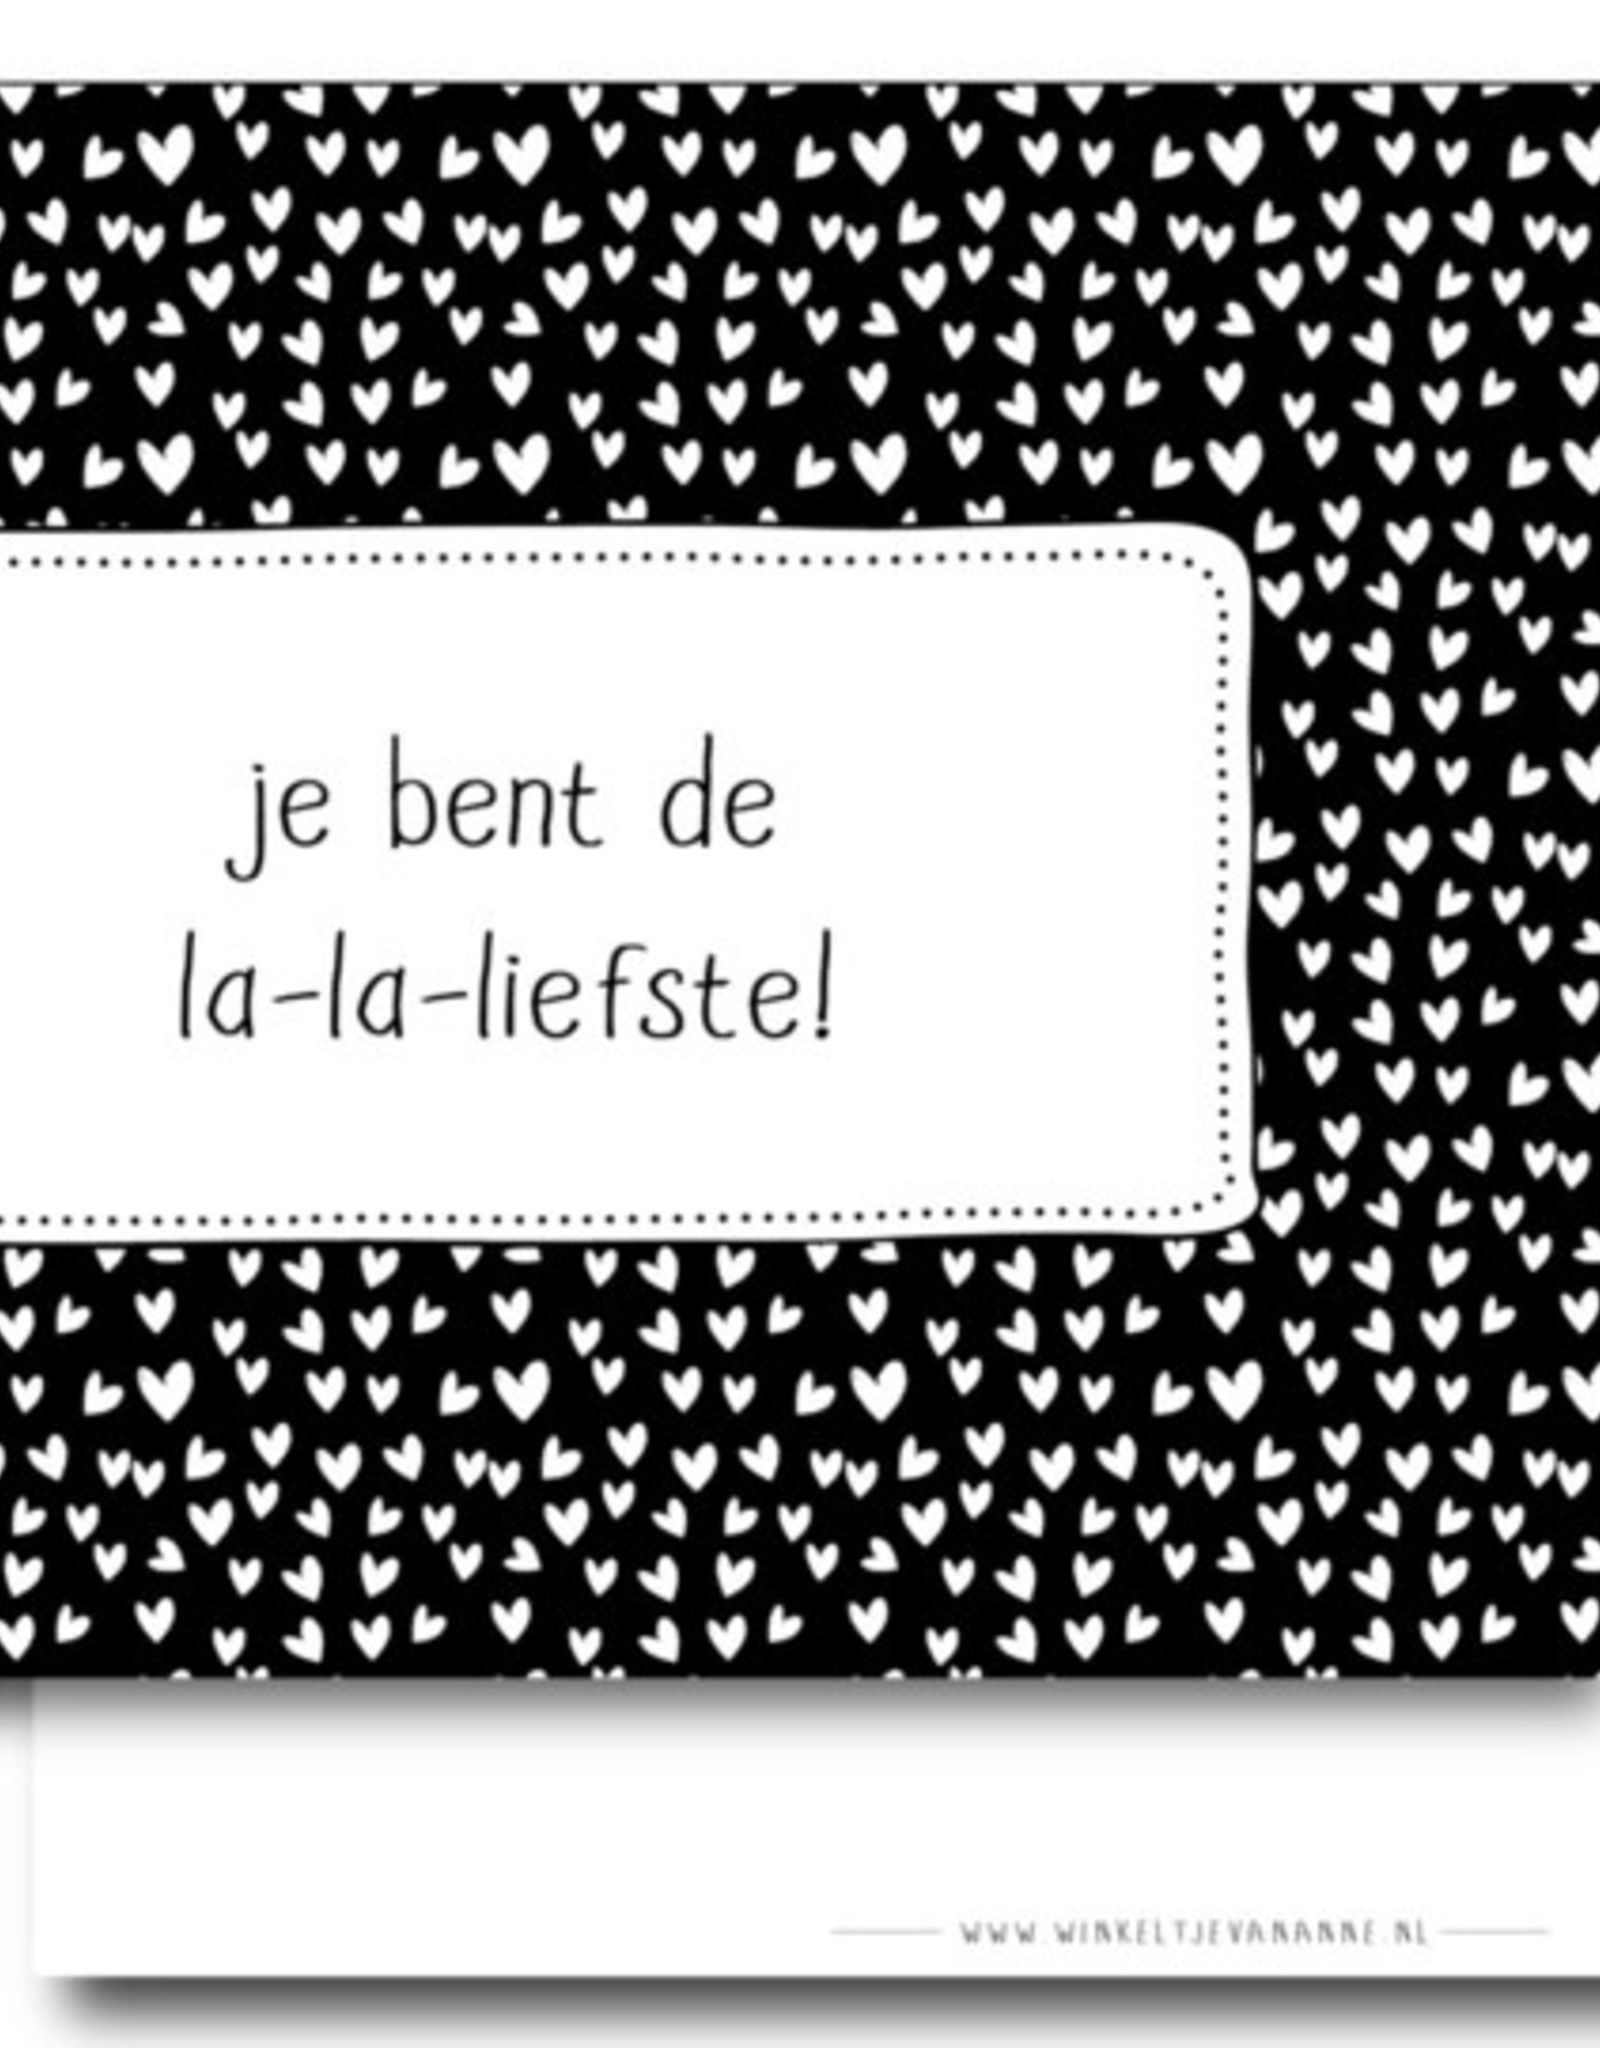 Winkeltje van Anne kaart a6 winkeltje van anne: je bent de la-la-liefste!